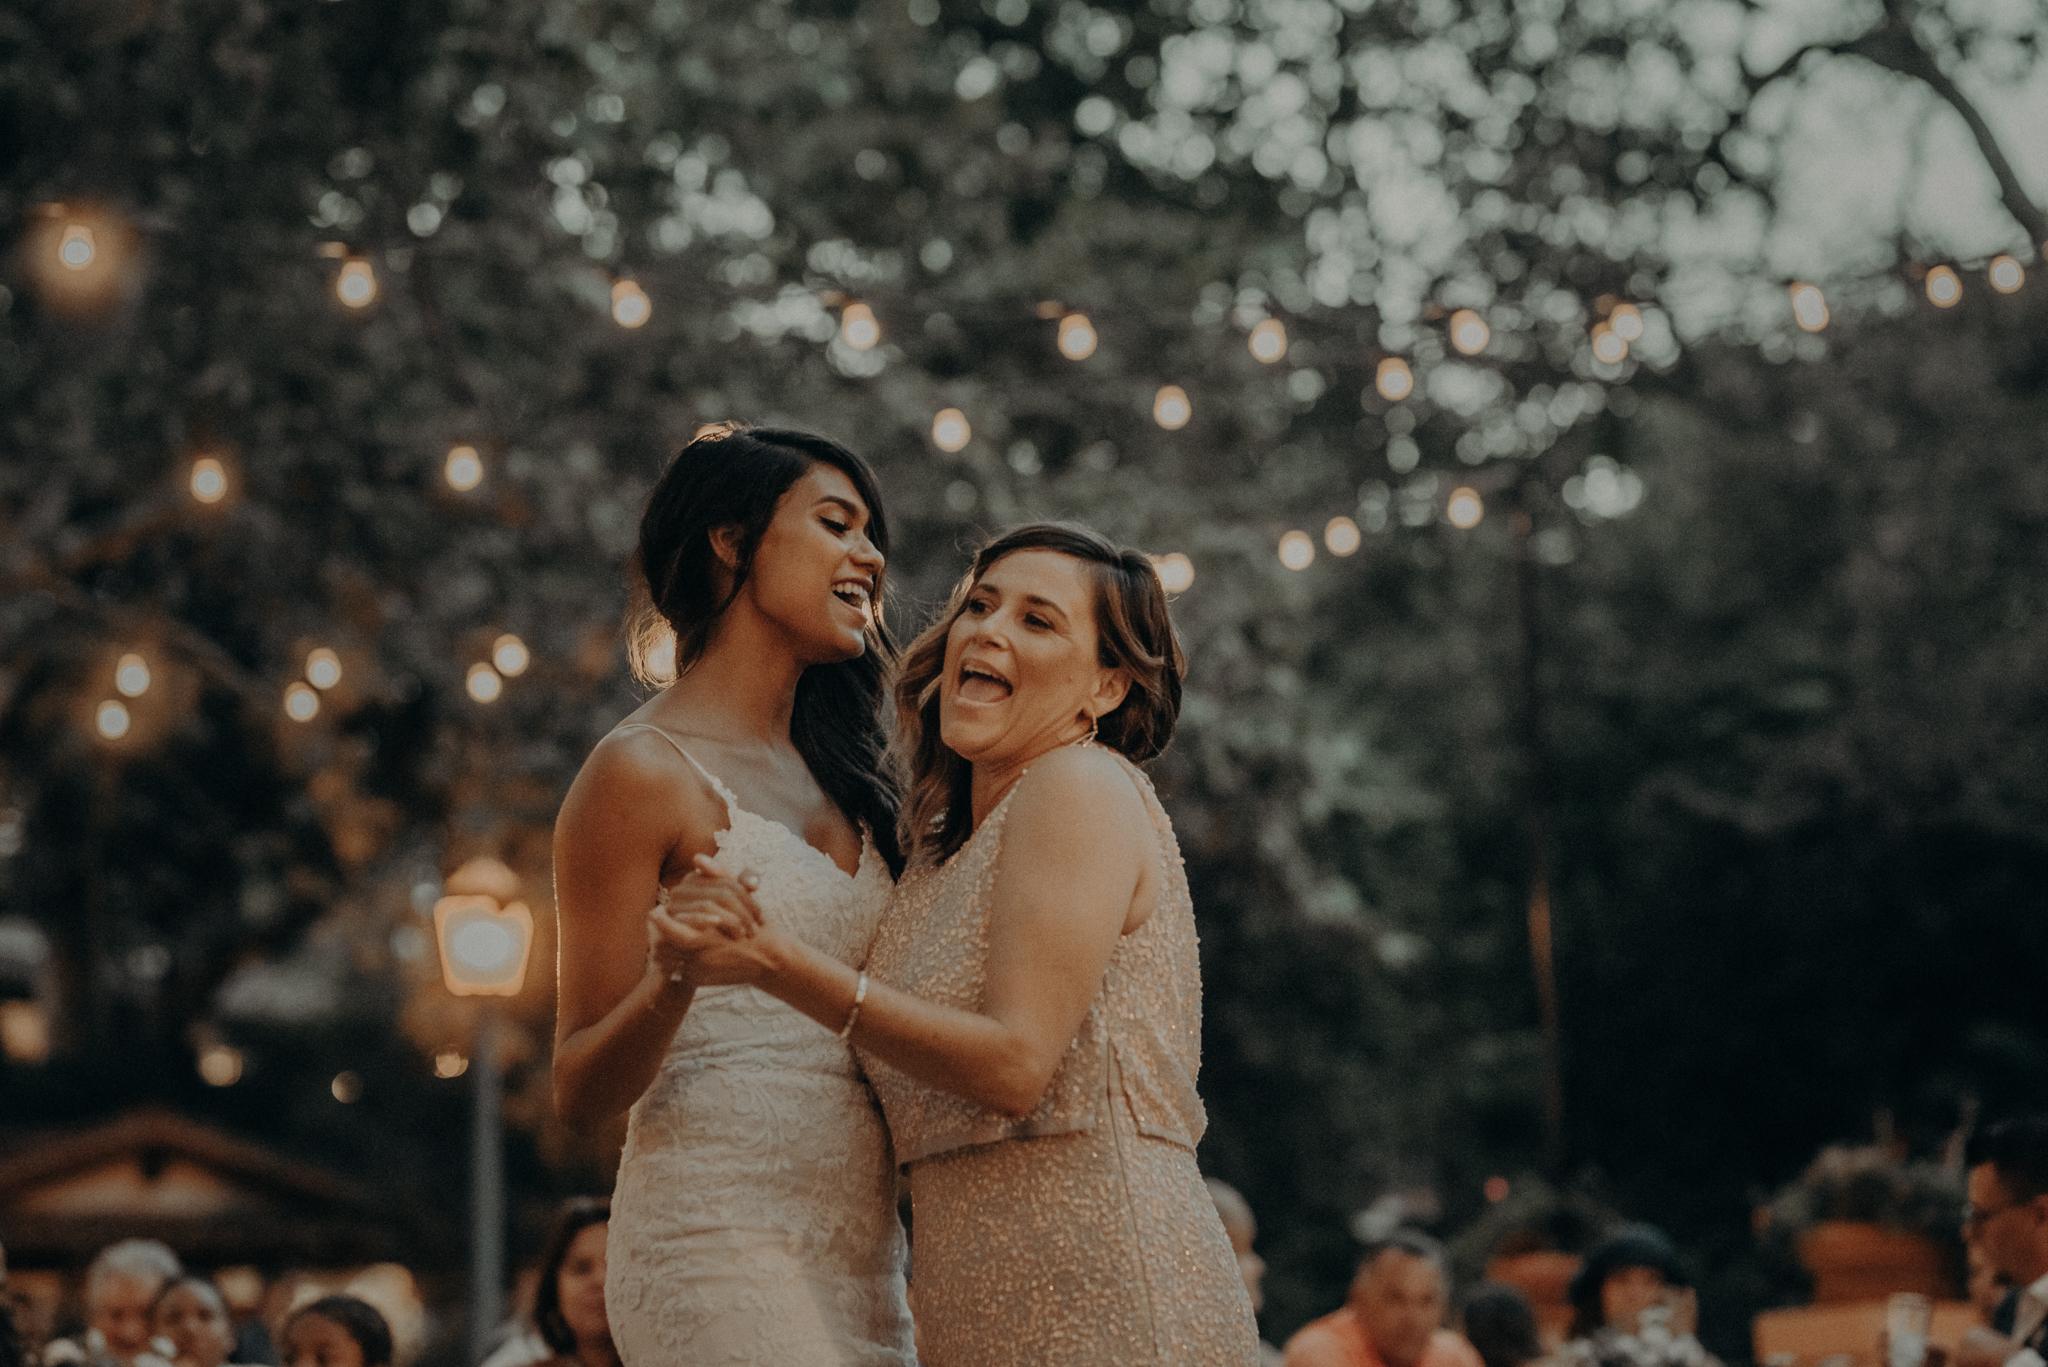 Isaiah + Taylor Photography - Rancho Las Lomas Wedding, Los Angeles Wedding Photographer-153.jpg